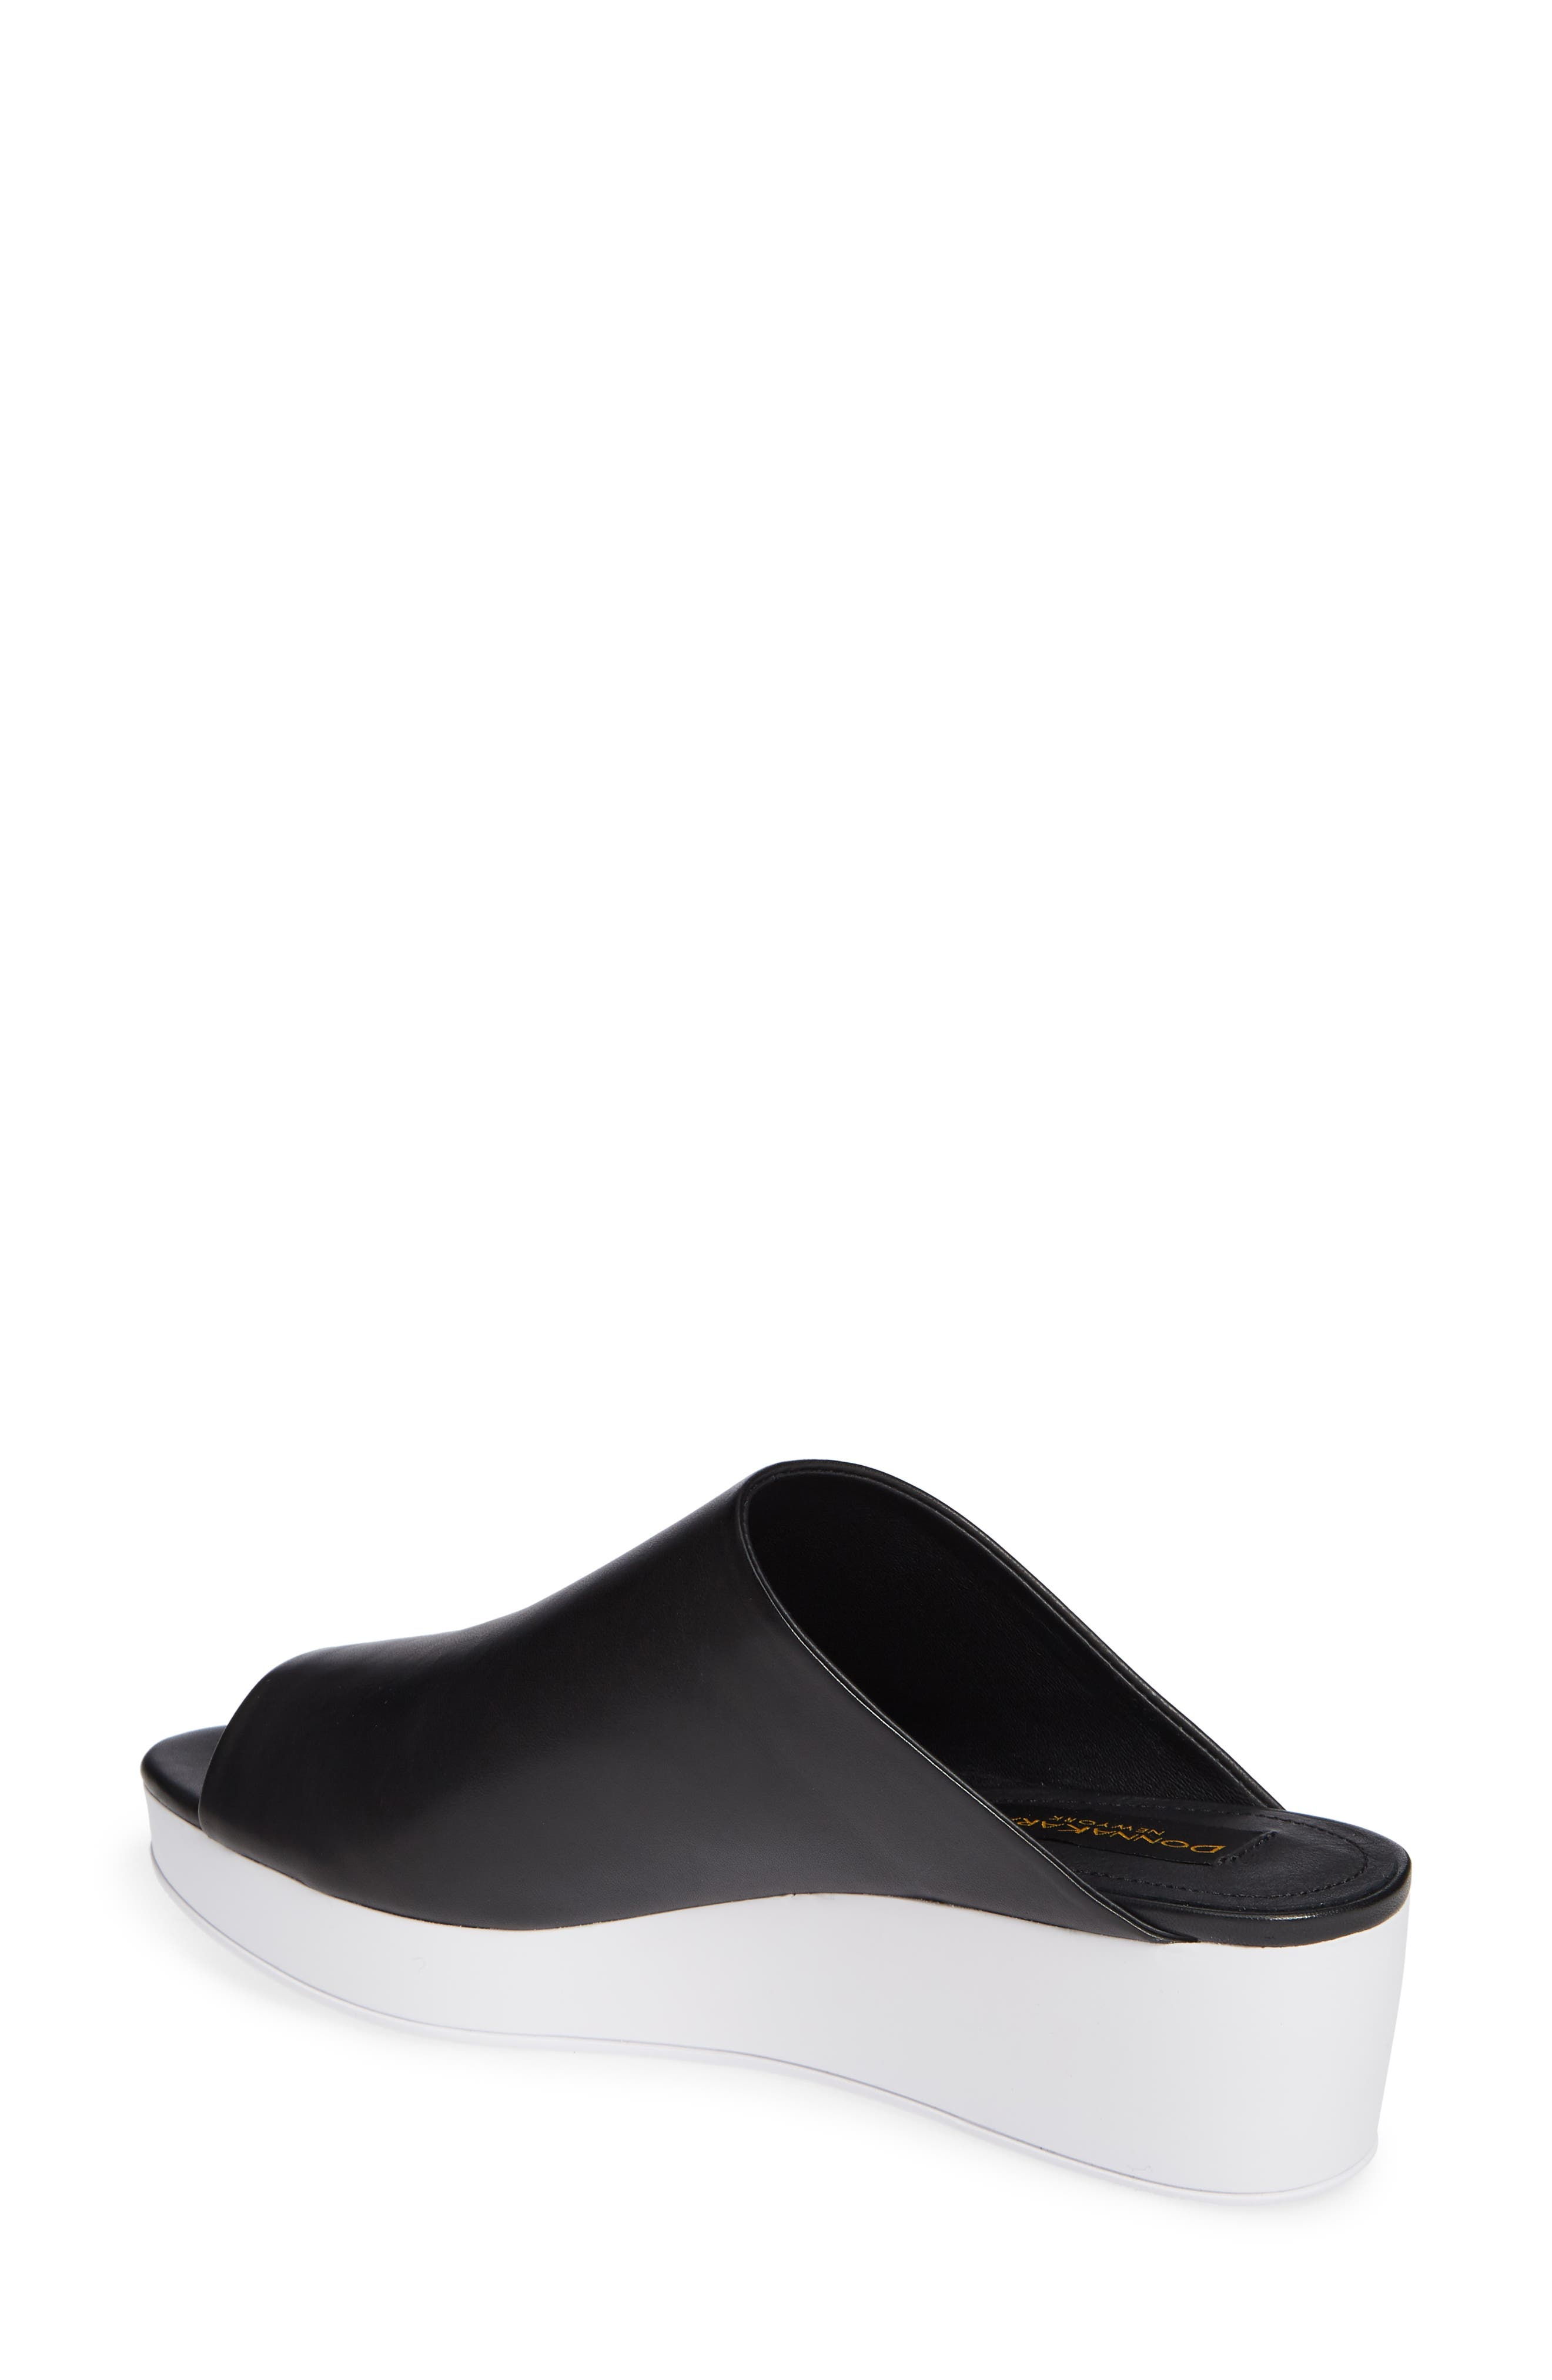 Donna Karan Reisley Wedge Slide Sandal,                             Alternate thumbnail 2, color,                             BLACK LEATHER